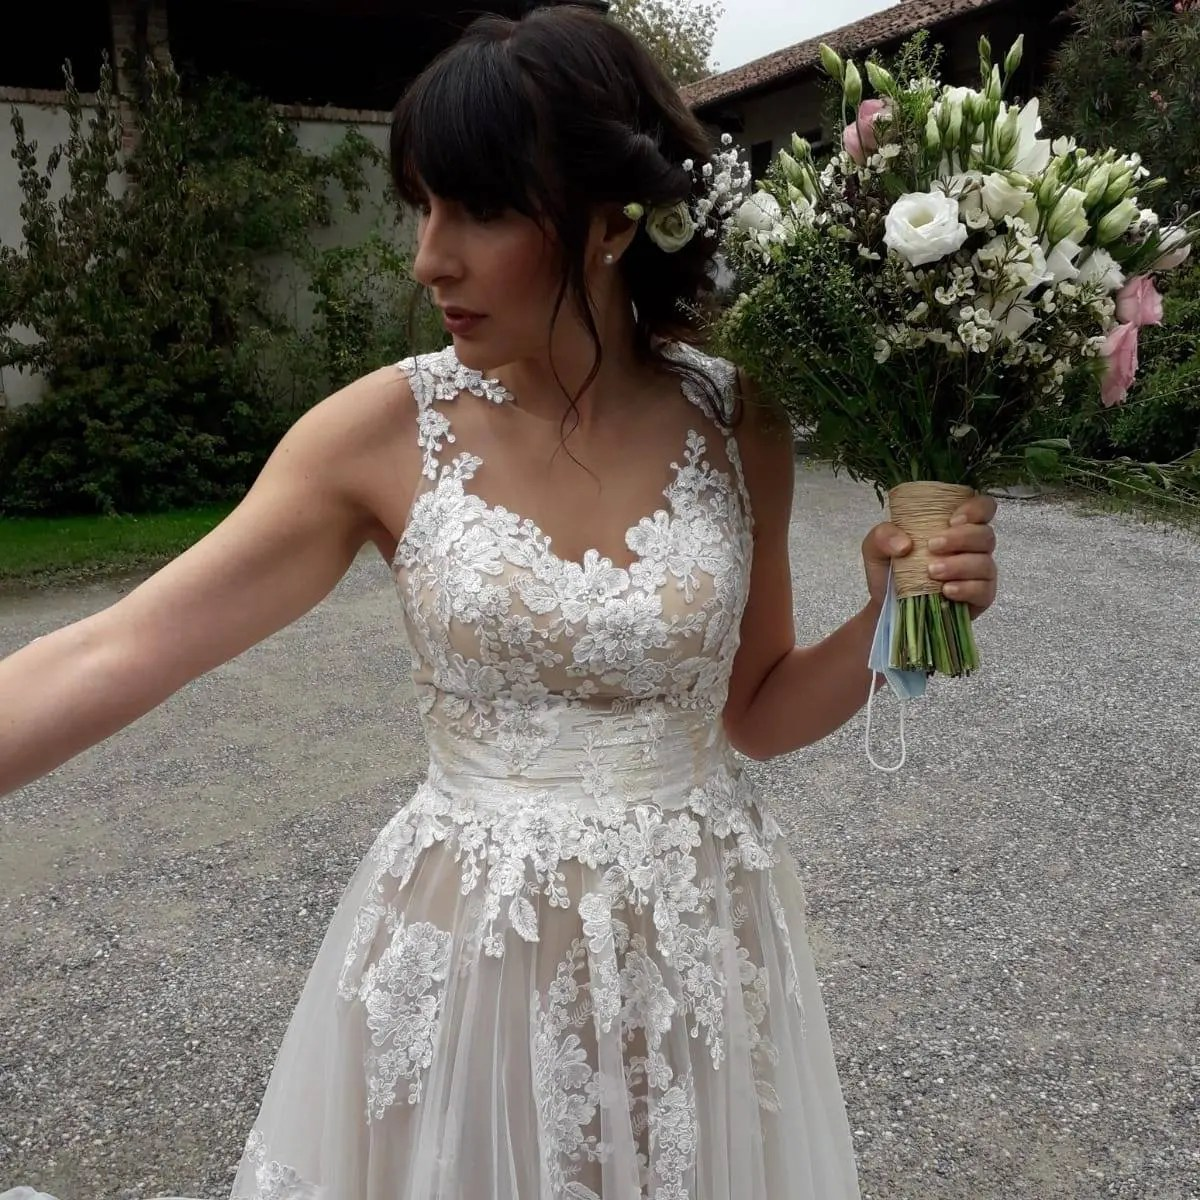 Lara Fiamenghi